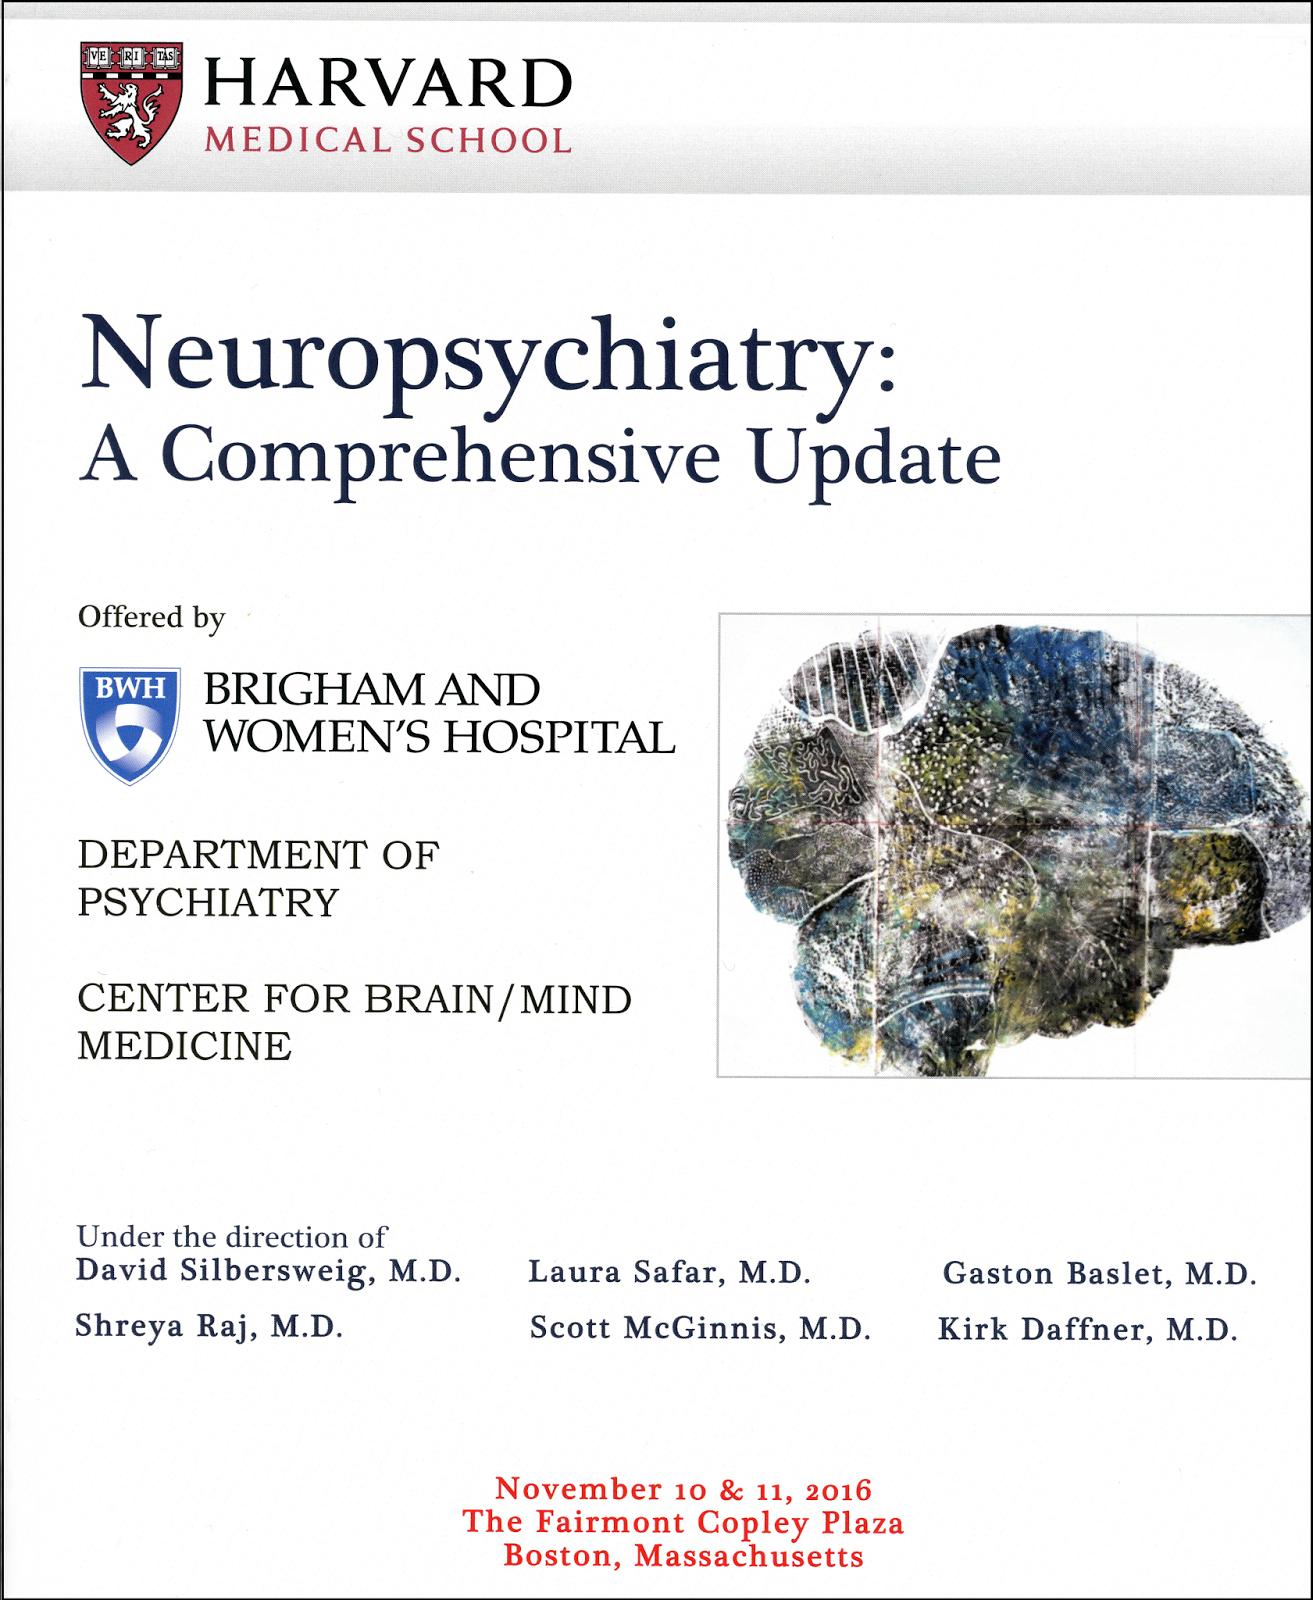 Real Psychiatry: The Harvard Neuropsychiatry Course